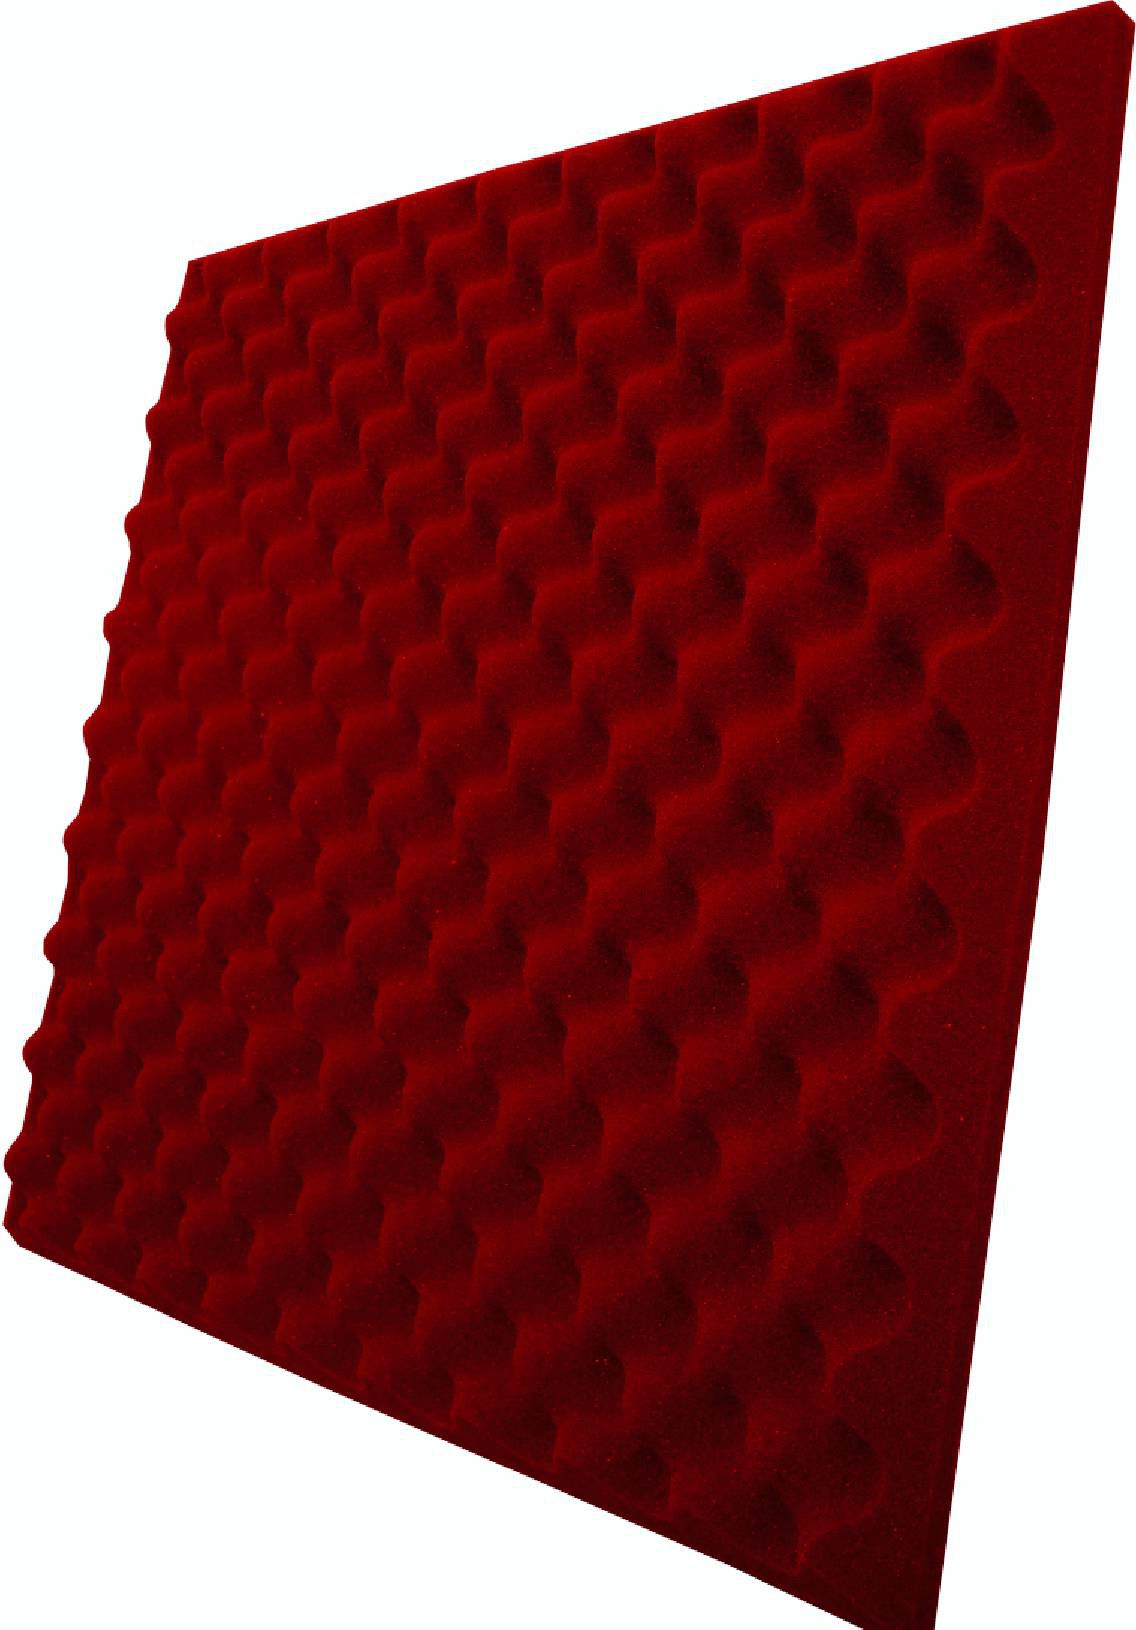 Espuma Perfilada - Kit 8 - Vermelho-40mm (2m²)  - Loja SPL Acústica